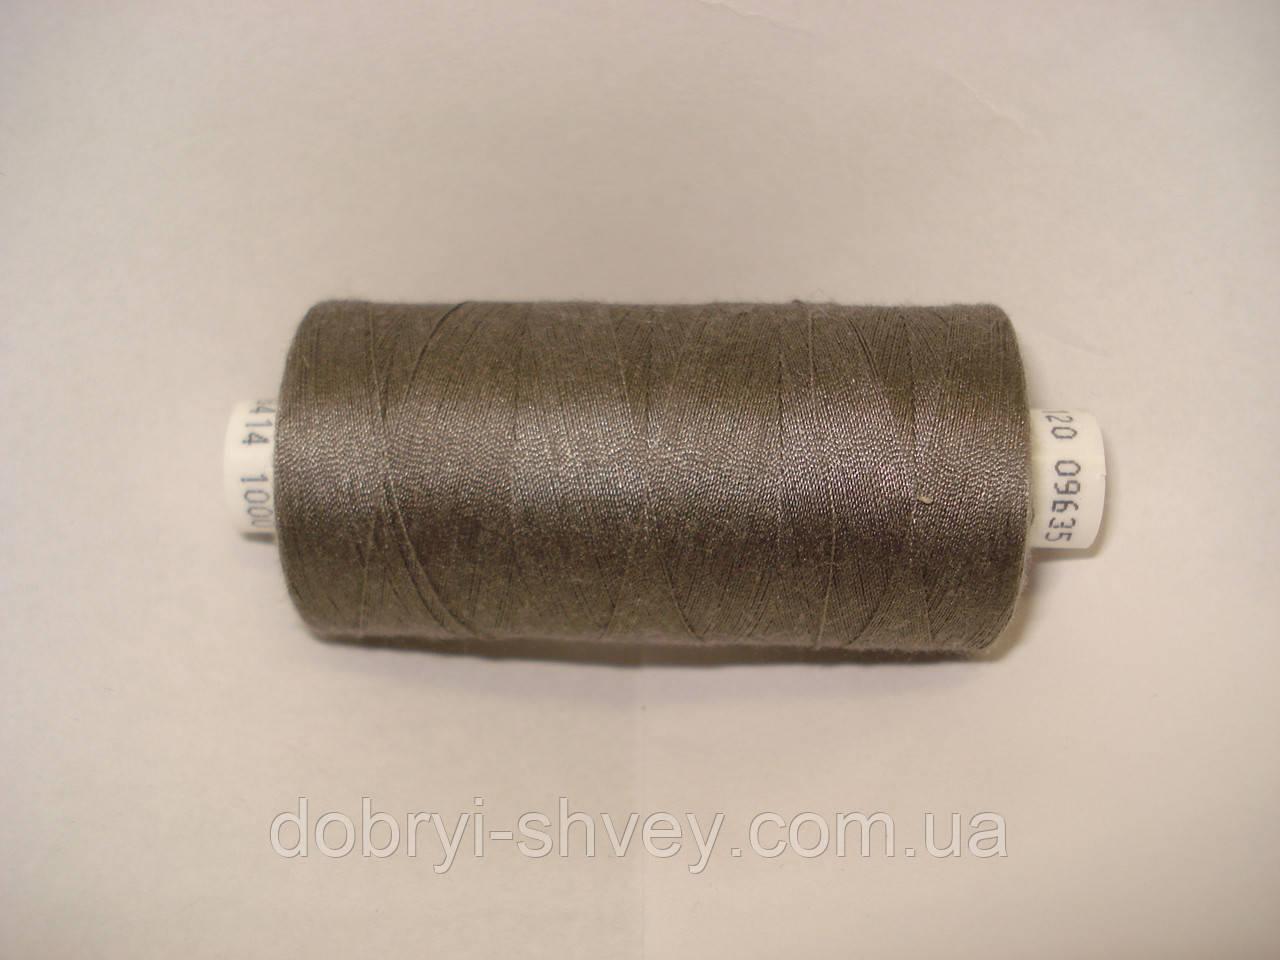 Нитка Coats EPIC №120 1000м.col 09635 серо-бежевый